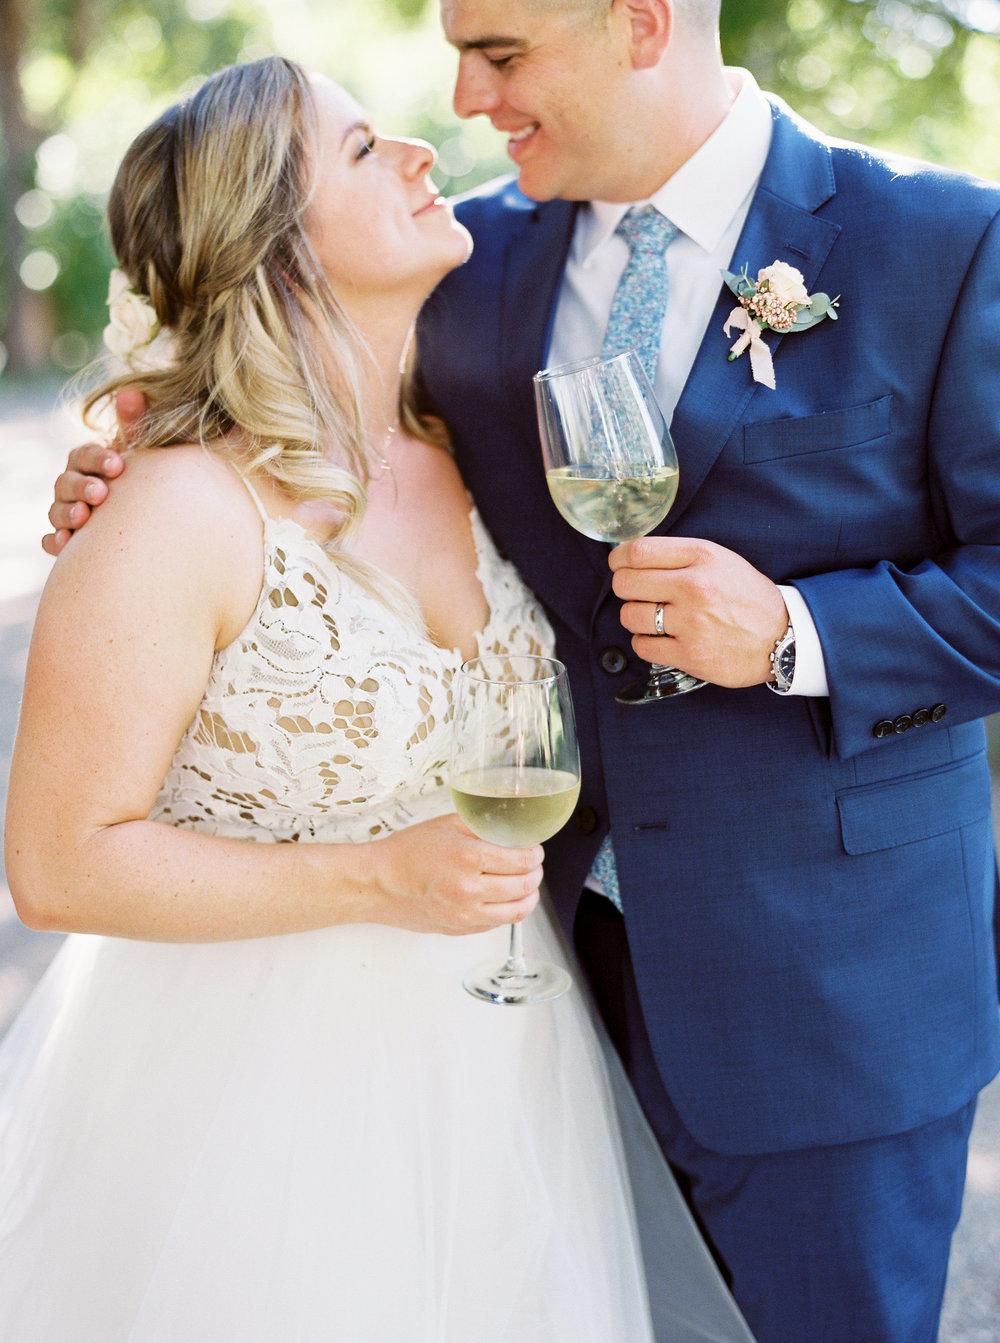 Durst-winery-wedding-in-lodi-calfornia-117.jpg